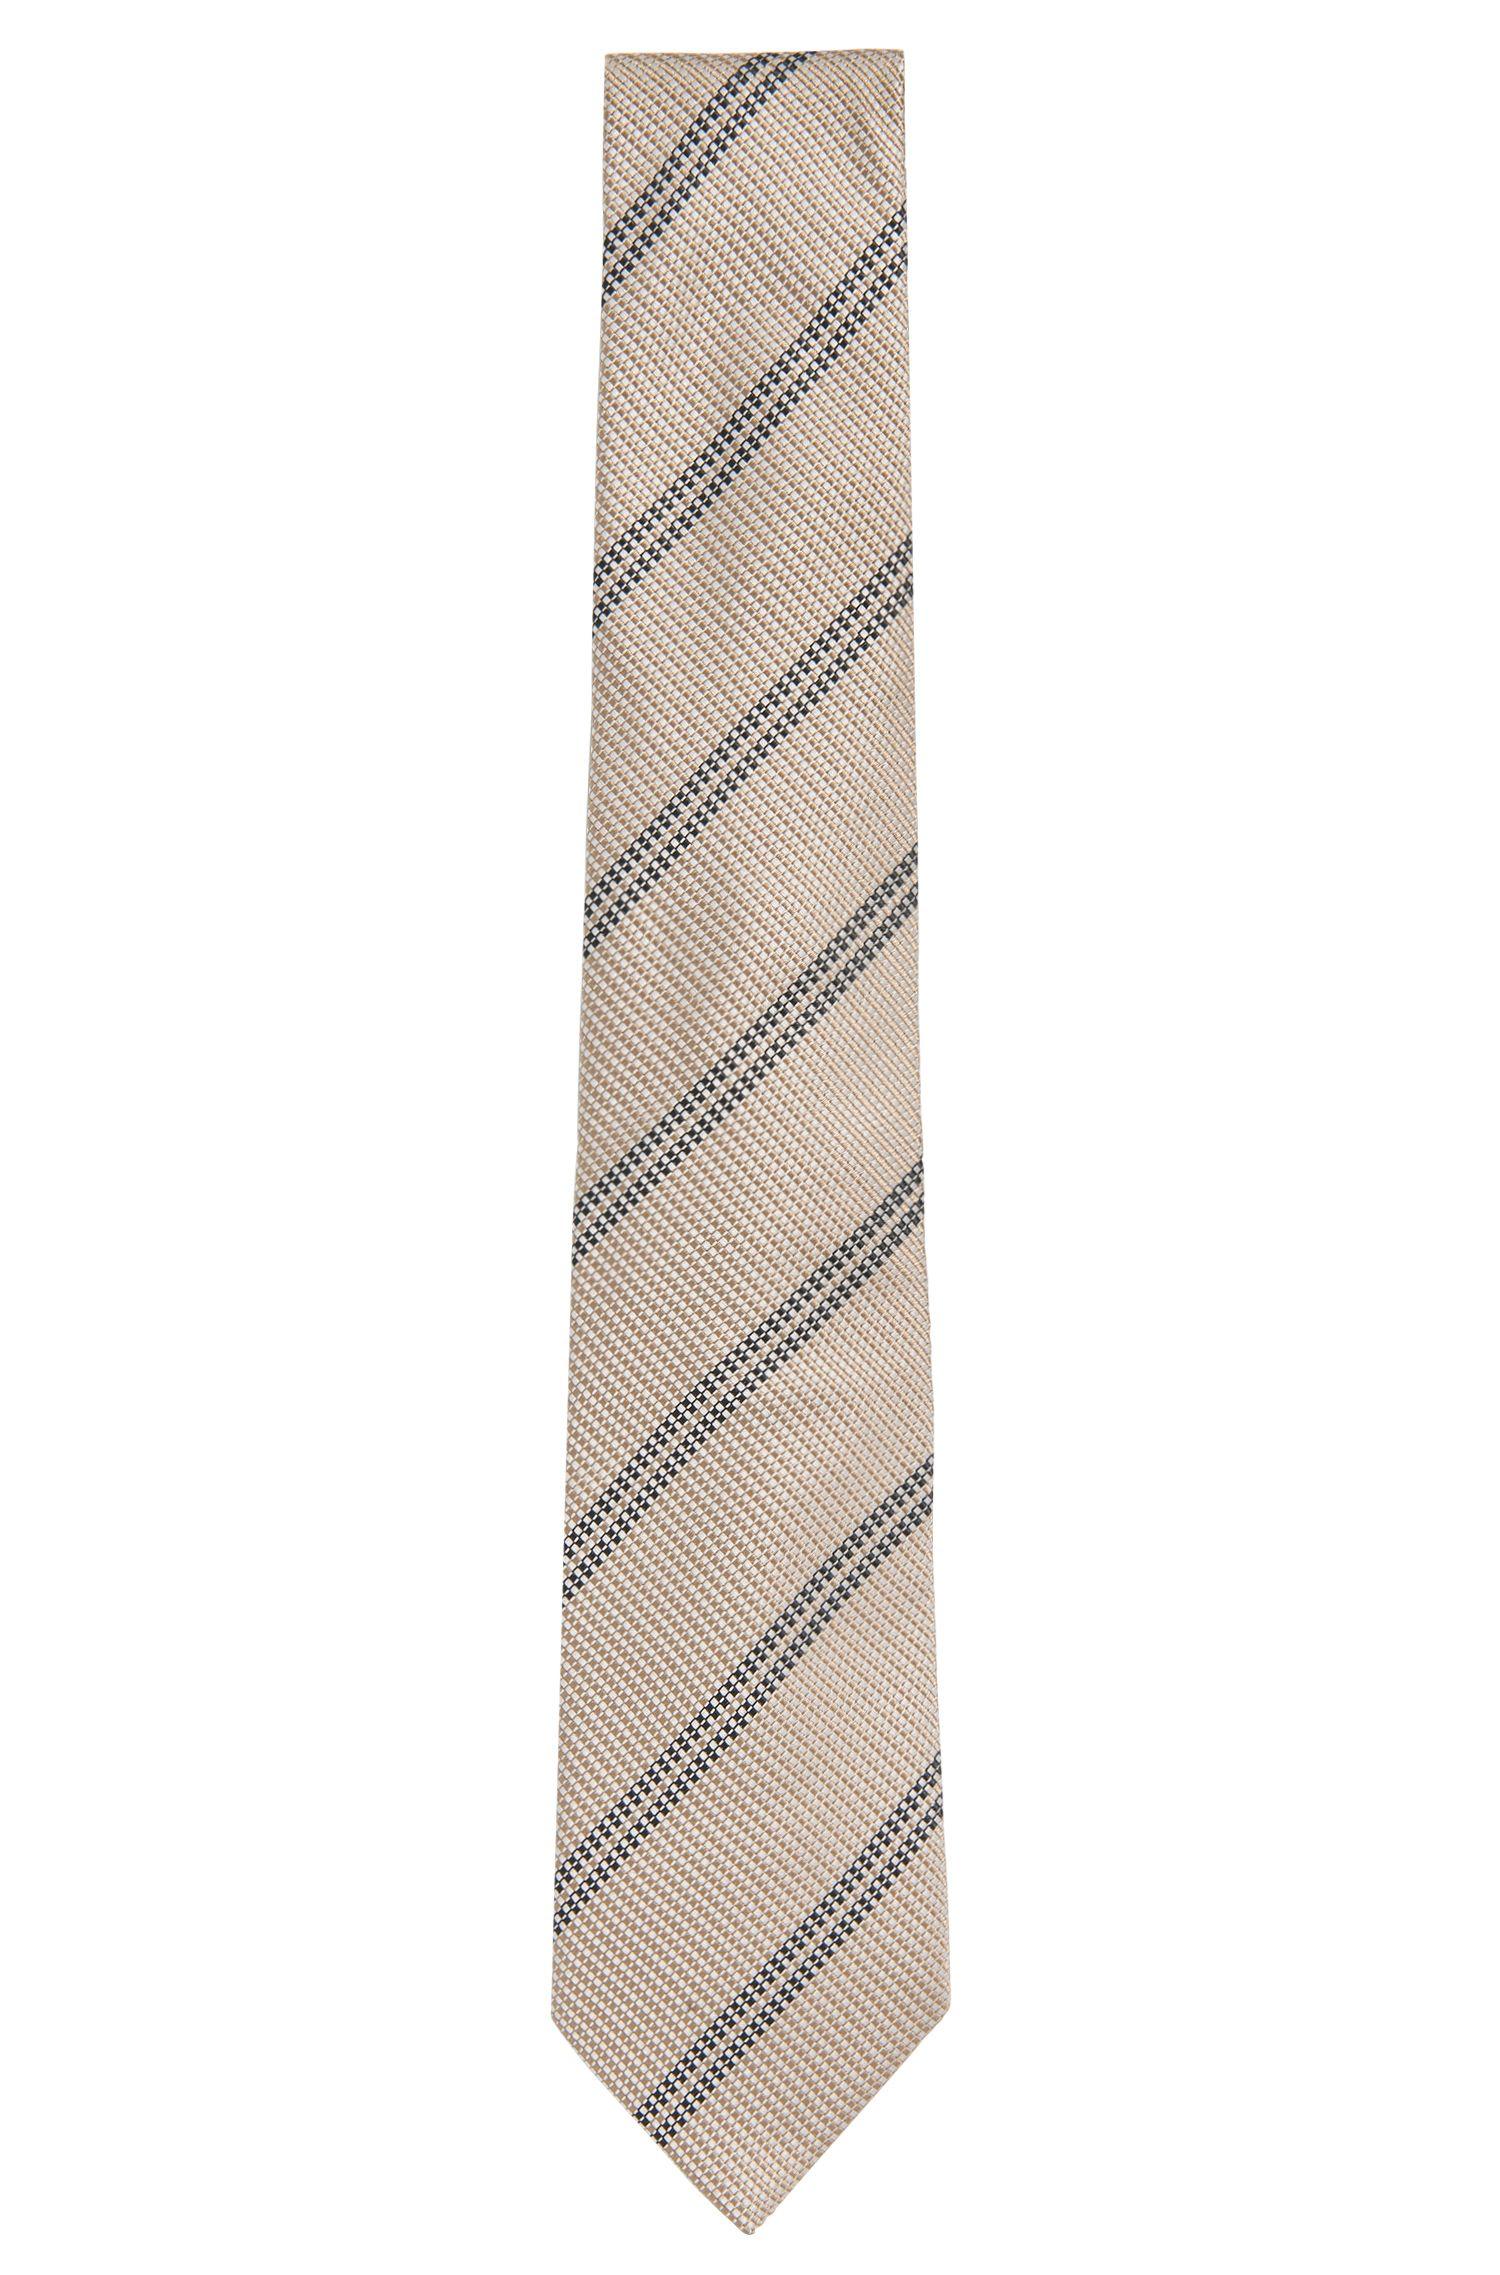 Gemusterte Krawatte aus Seide: 'T-Tie 7,5 cm'